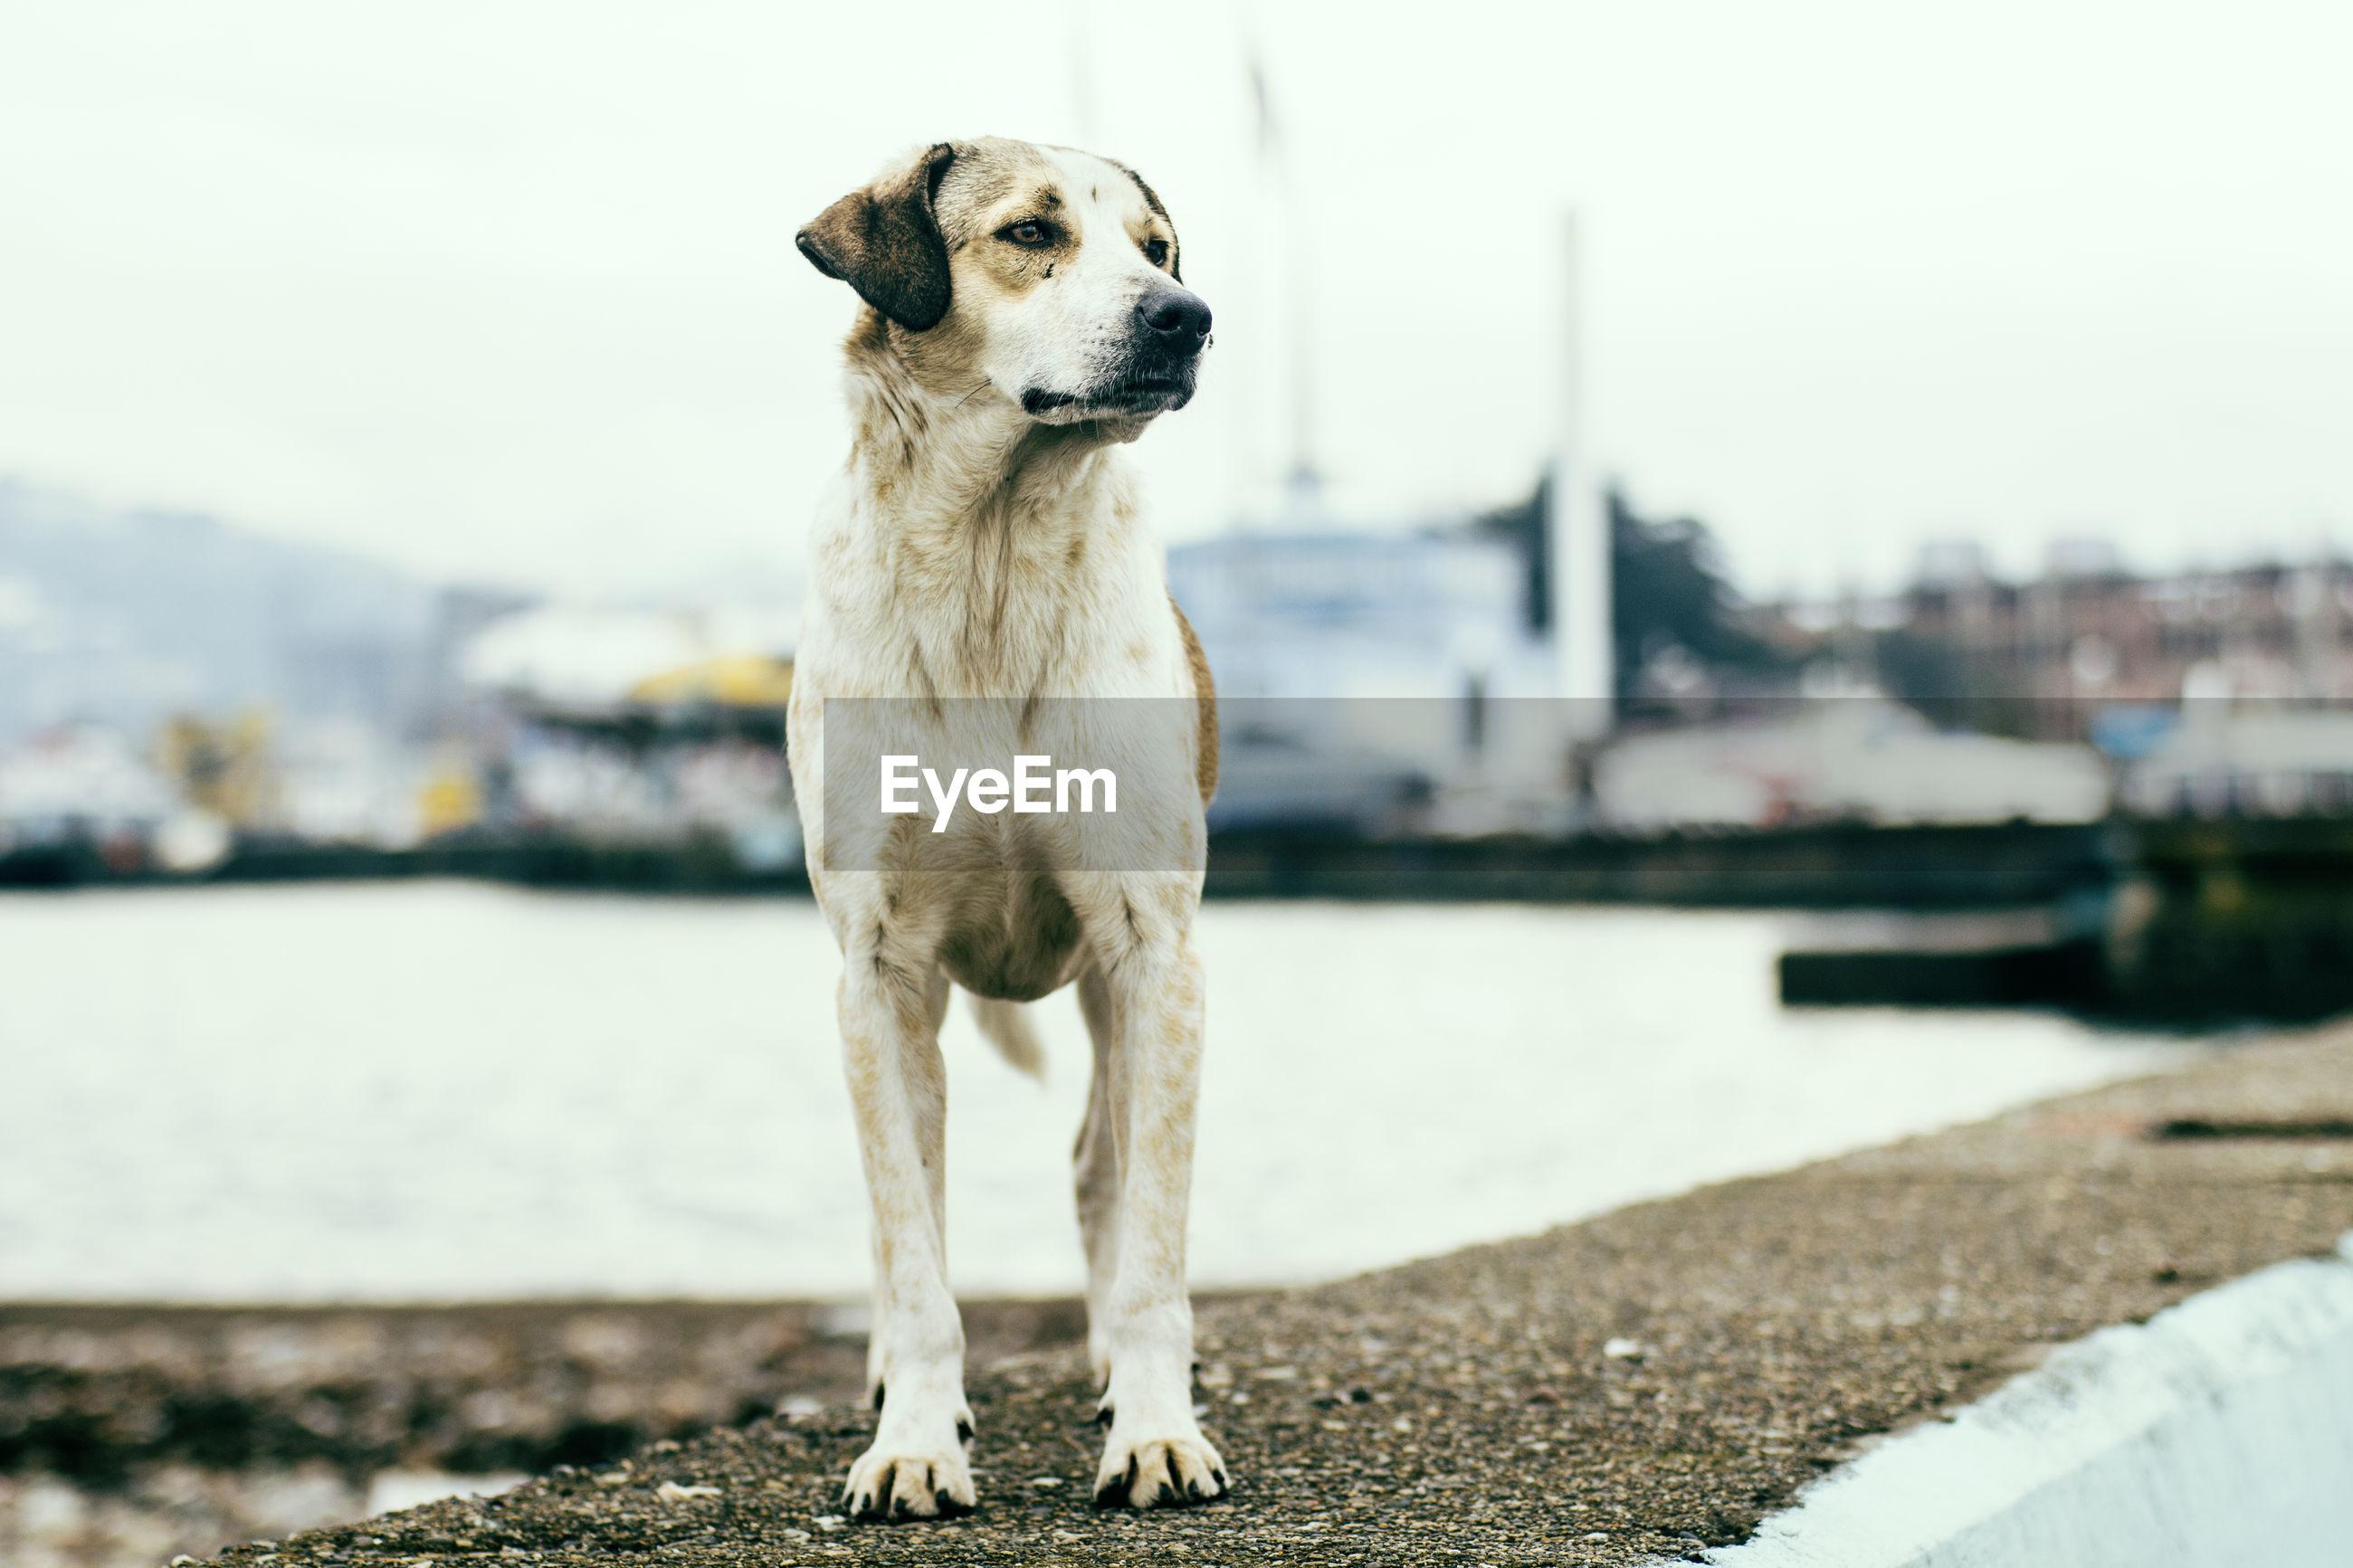 Dog looking away lakeside